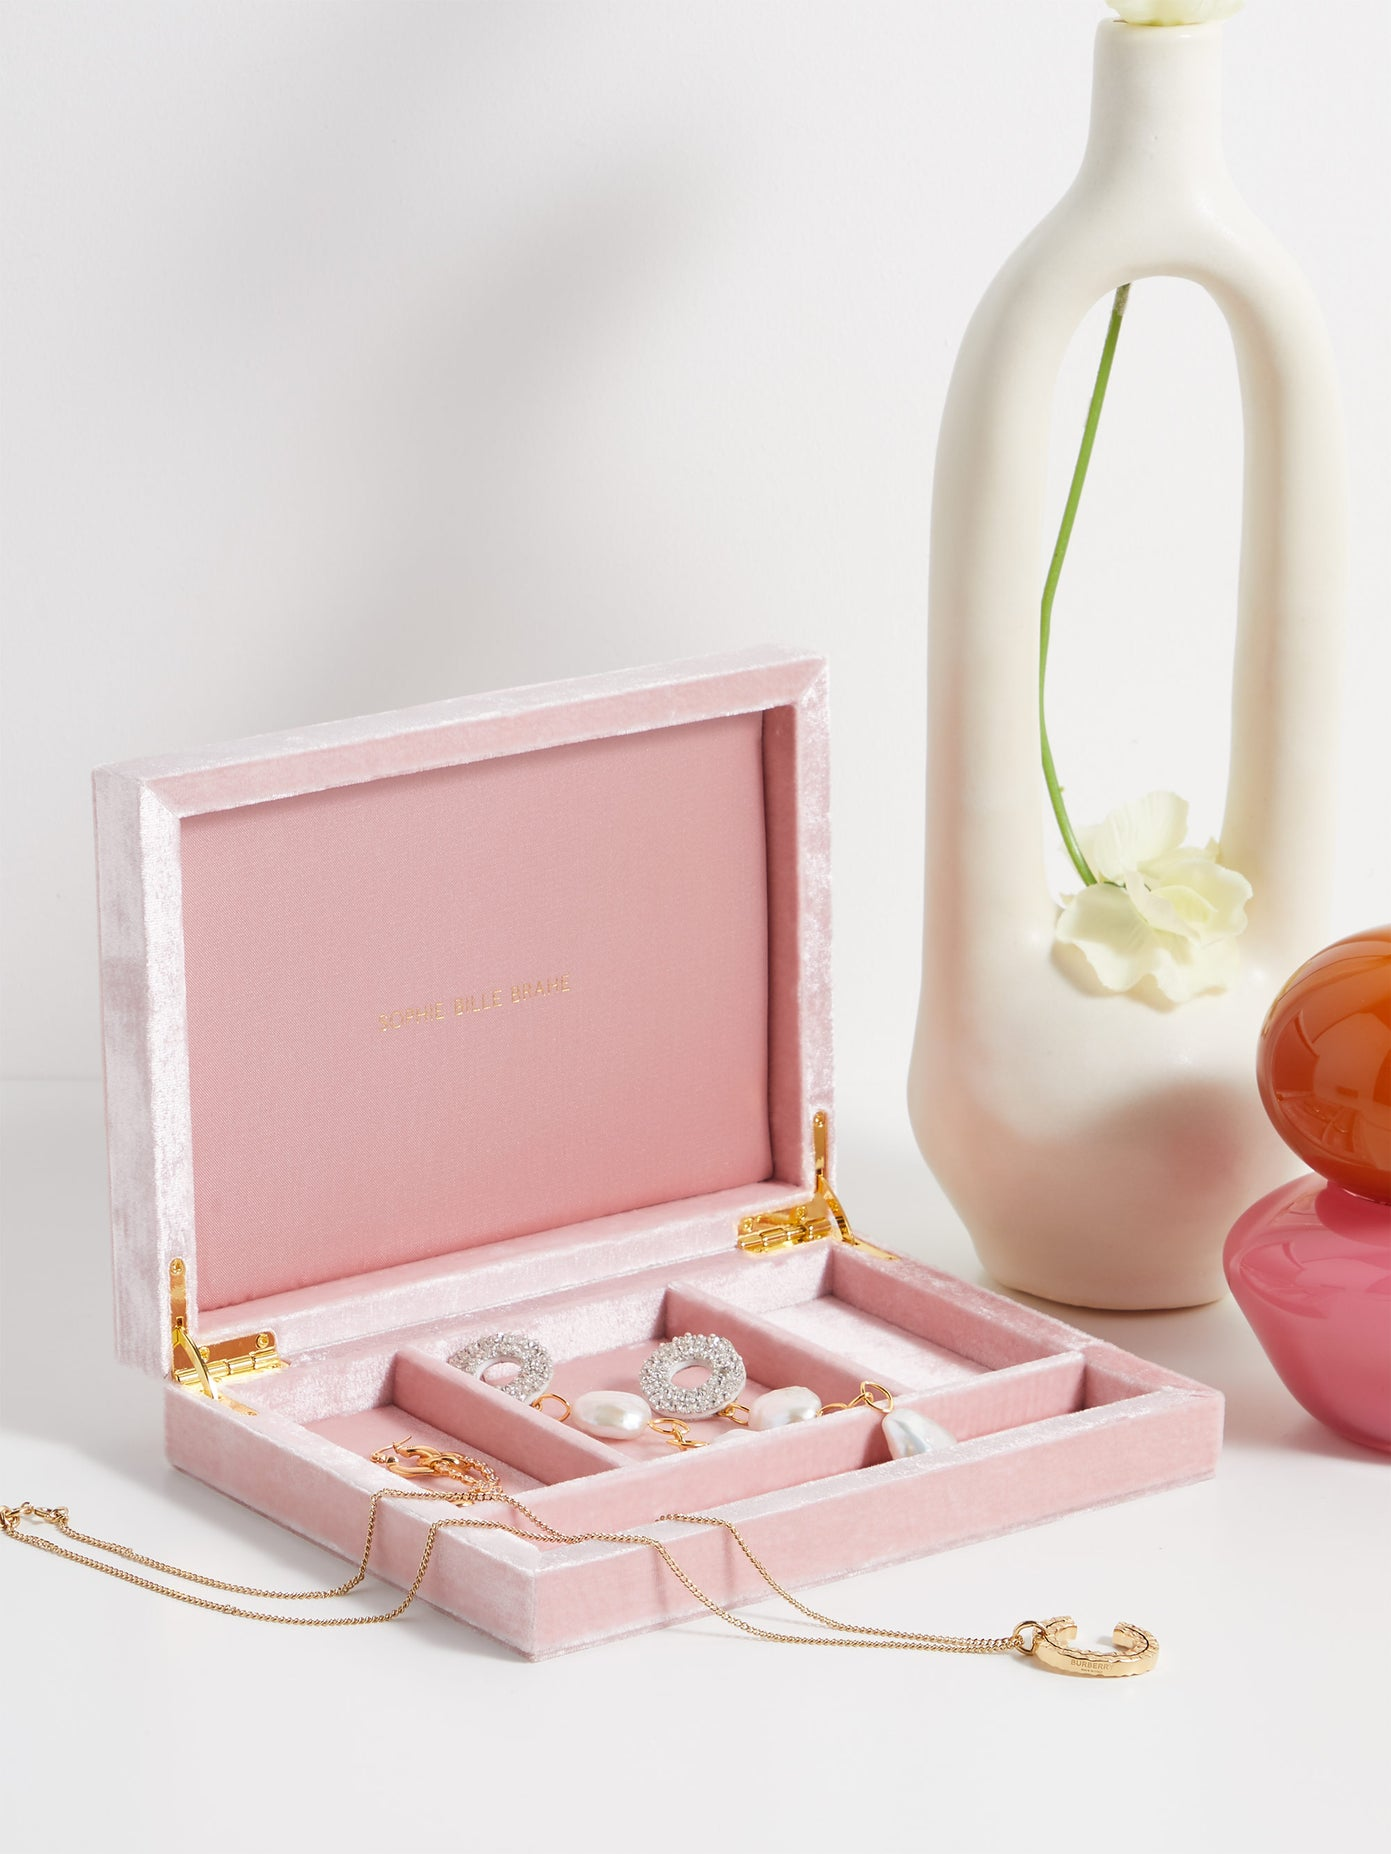 Sophie Bille Brahe Pink Velvet Jewellery Box